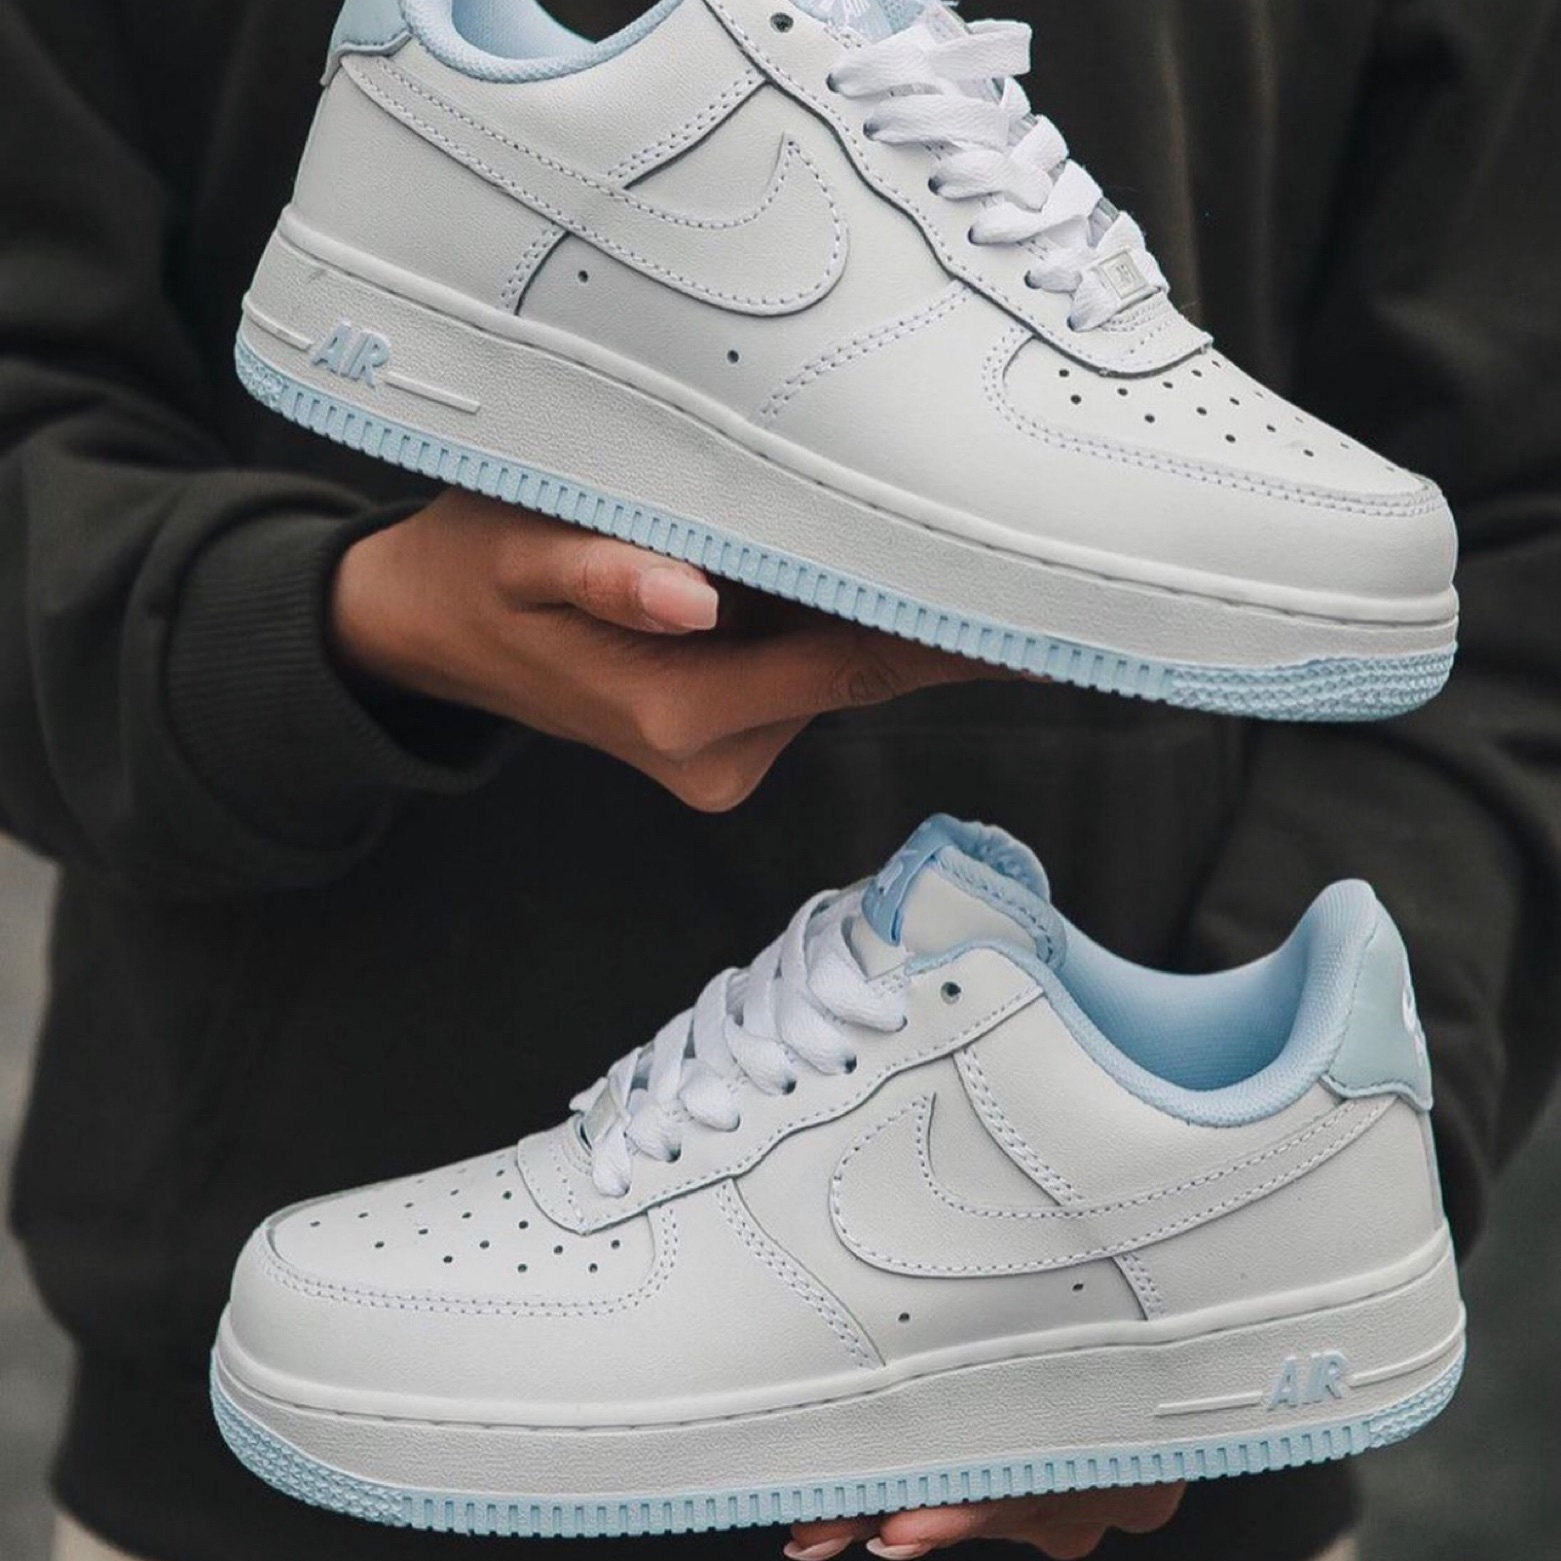 Nike Air Force 1 Hydrogen White/Blue